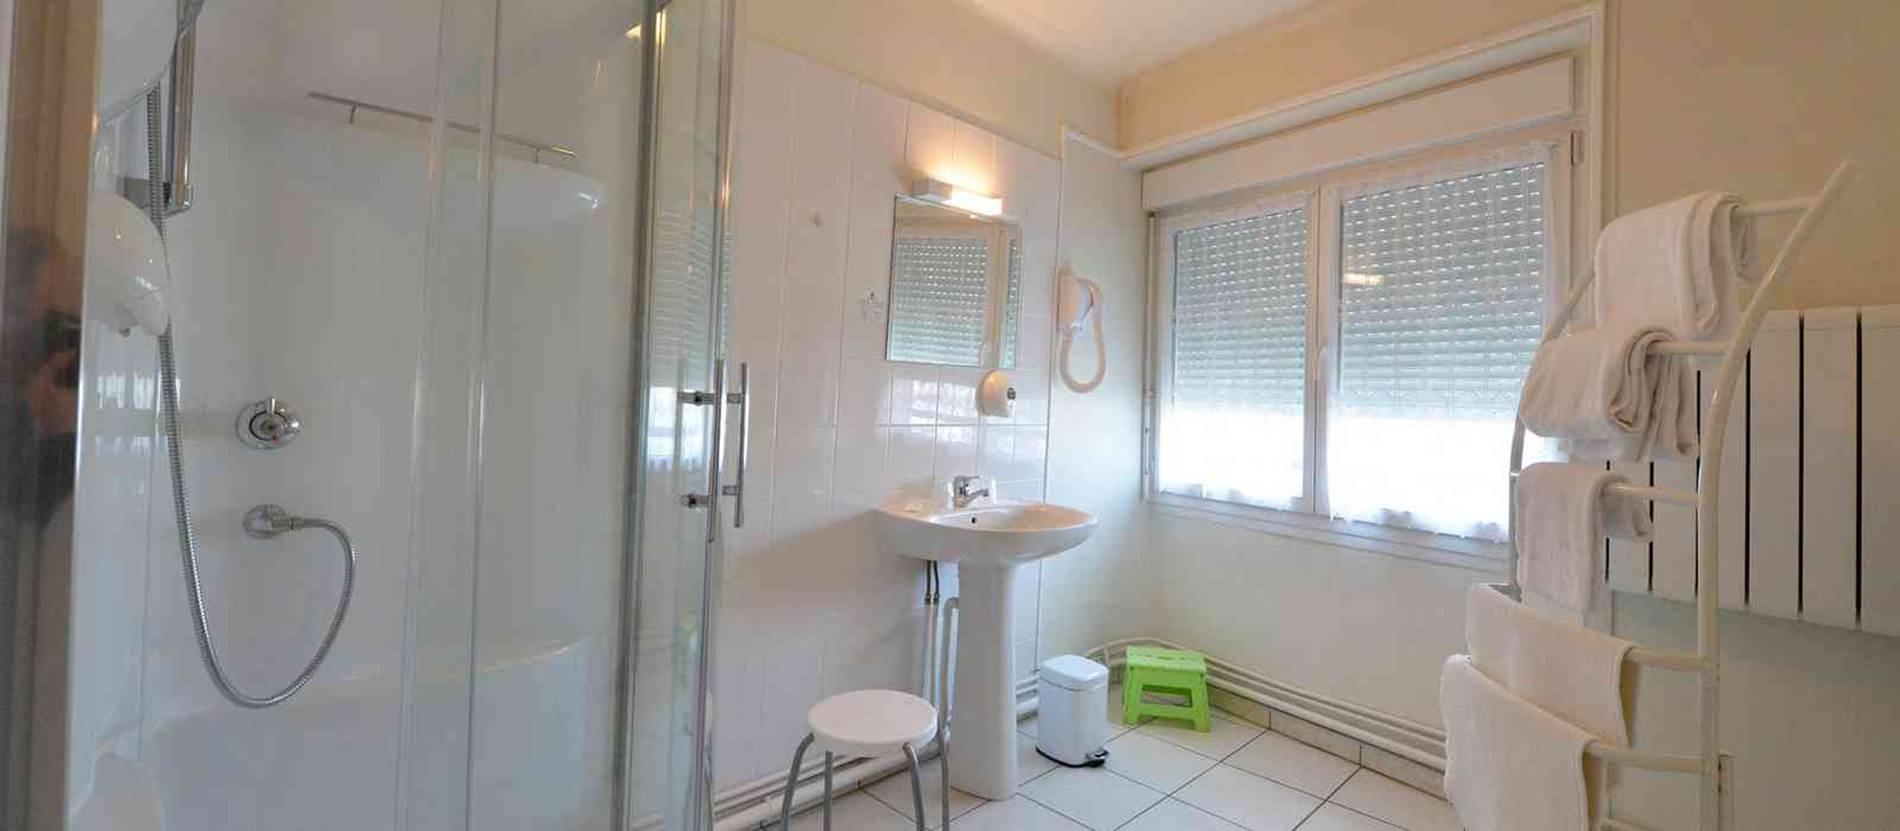 hotel-la-fontaine-theix-Morbihan-Bretagne-Sud-salle-d'eau © hotel-la-fontaine-thei